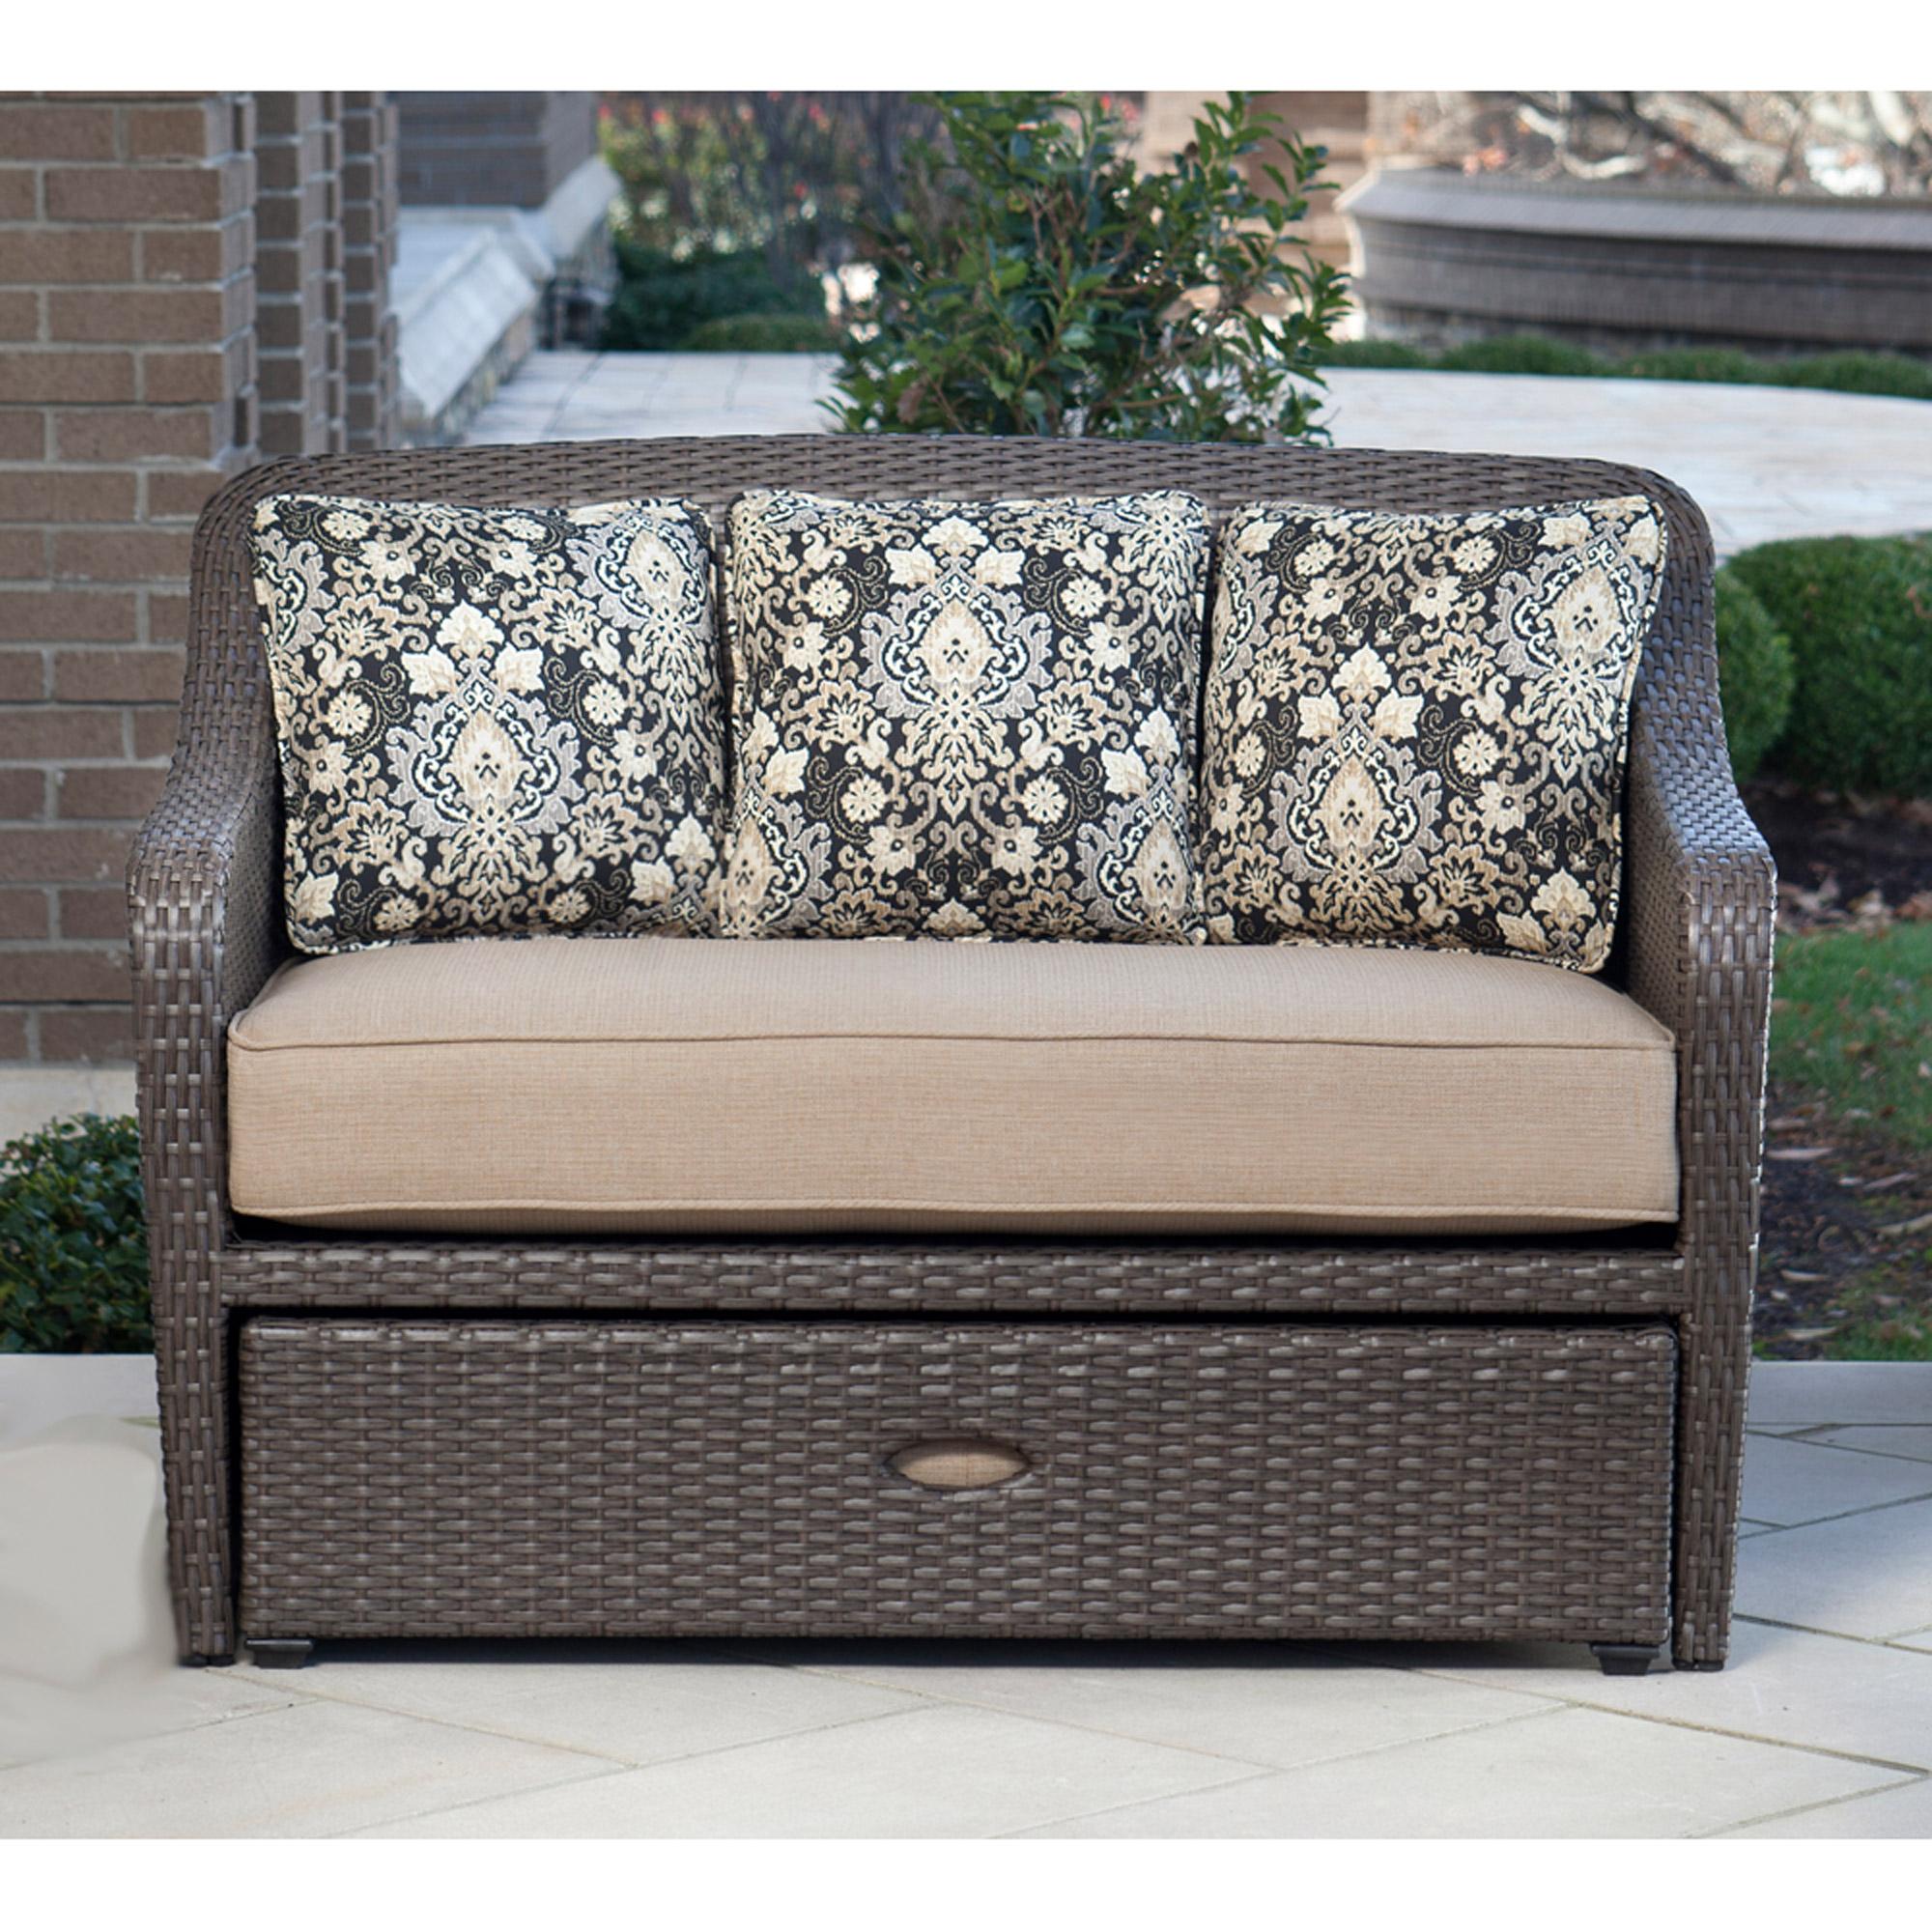 Sofa for Hanover Outdoor Furniture Soho 4 Piece Modern Lounge Set